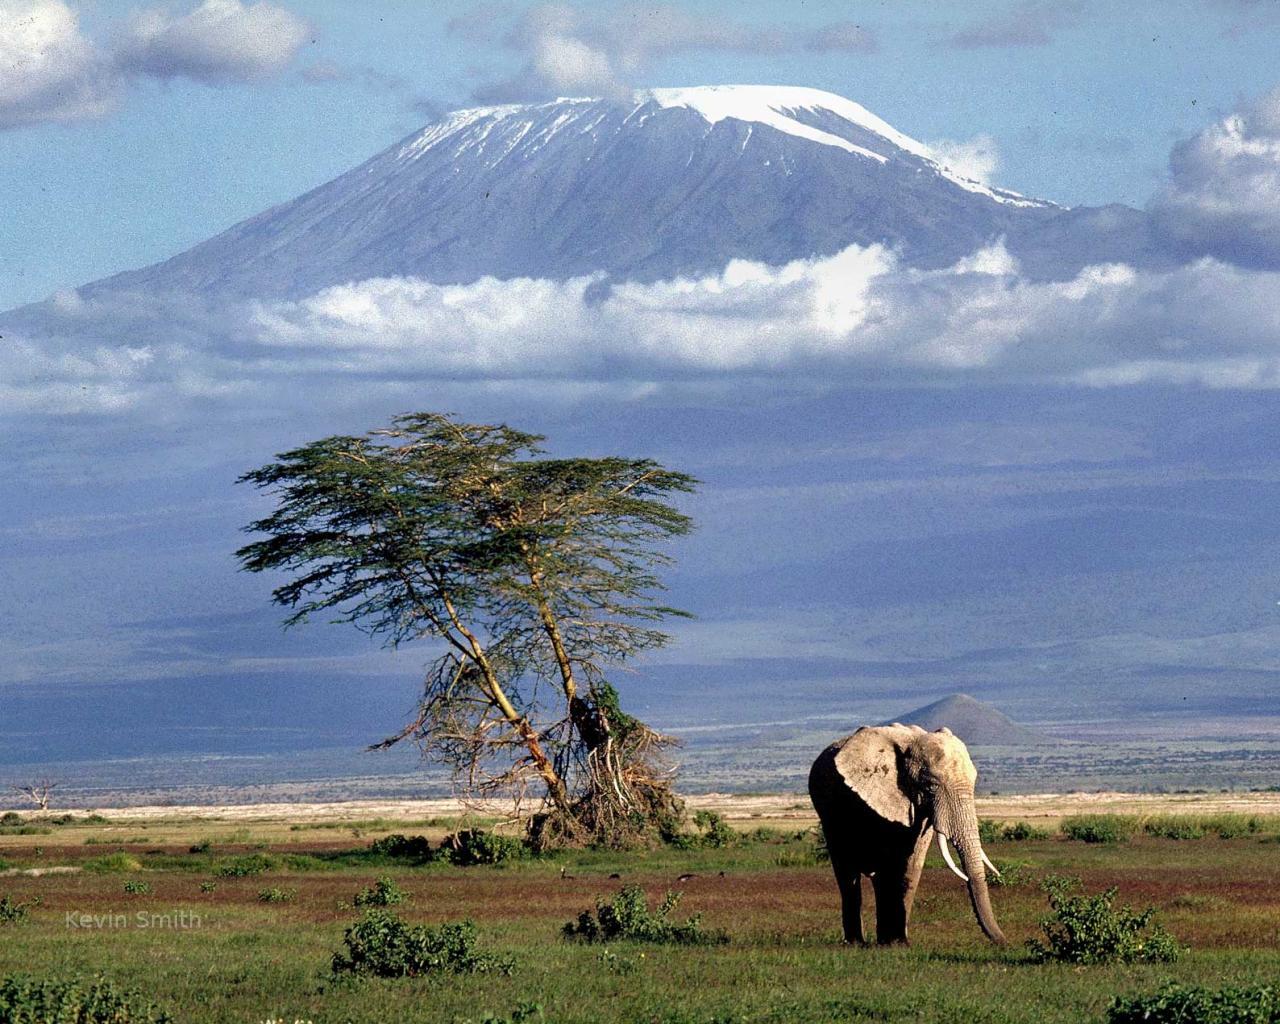 http://www.naturepicoftheday.com/npods/2009/february/plains_below_kilimanjaro_1280x1024.jpg